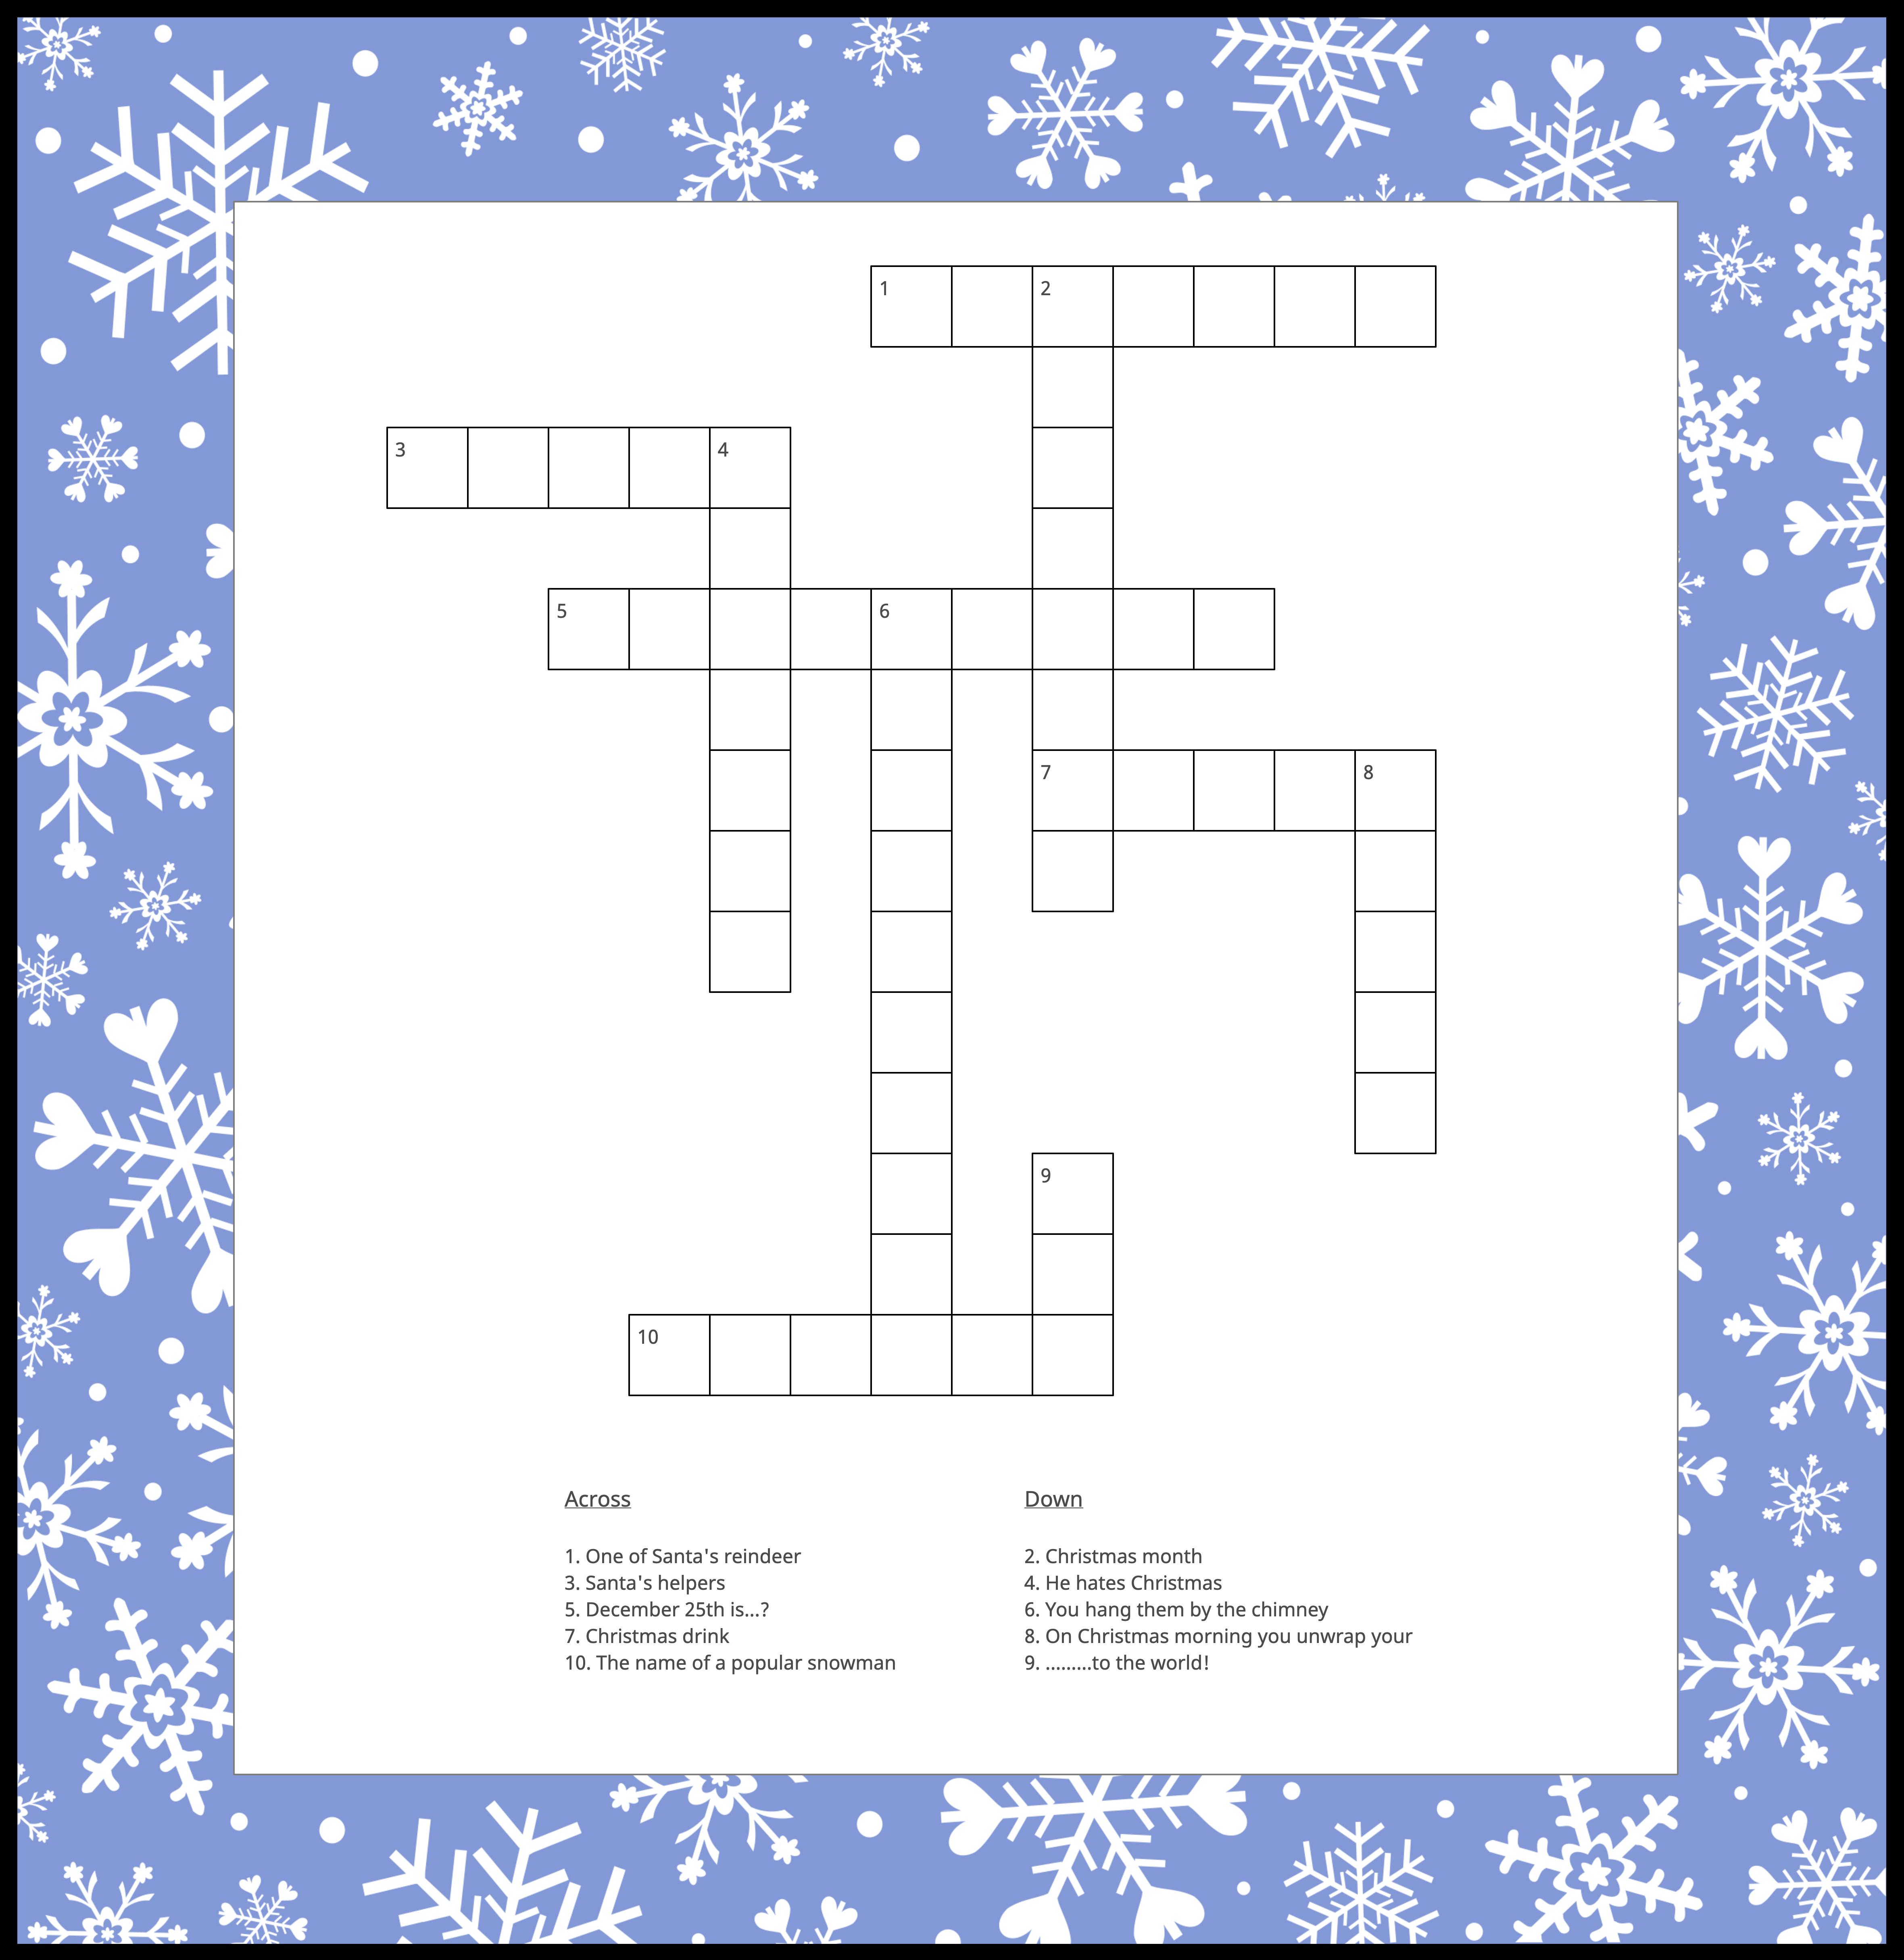 christmas-crossword-puzzle